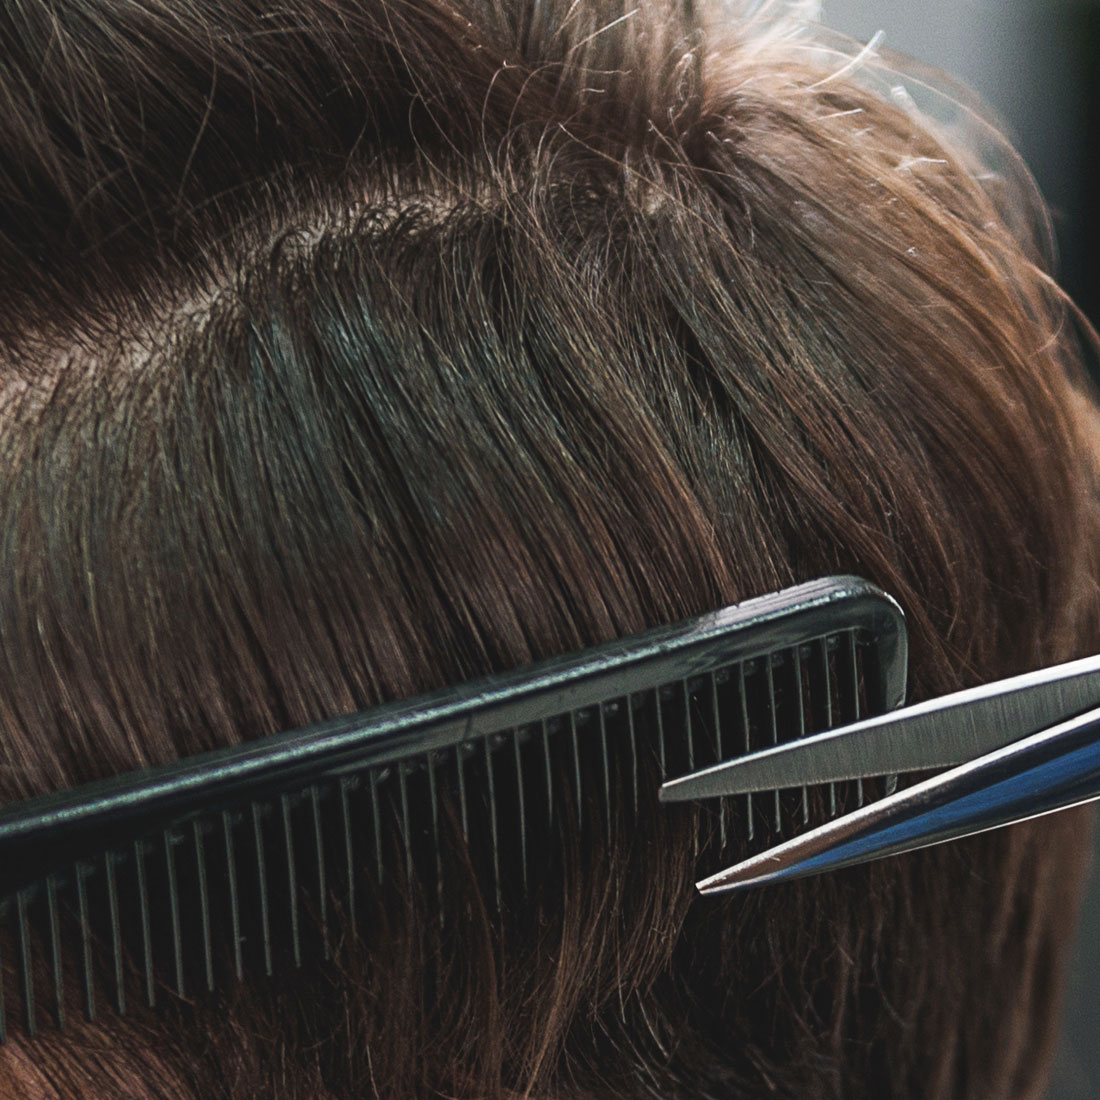 Men's Haircut with Scissors